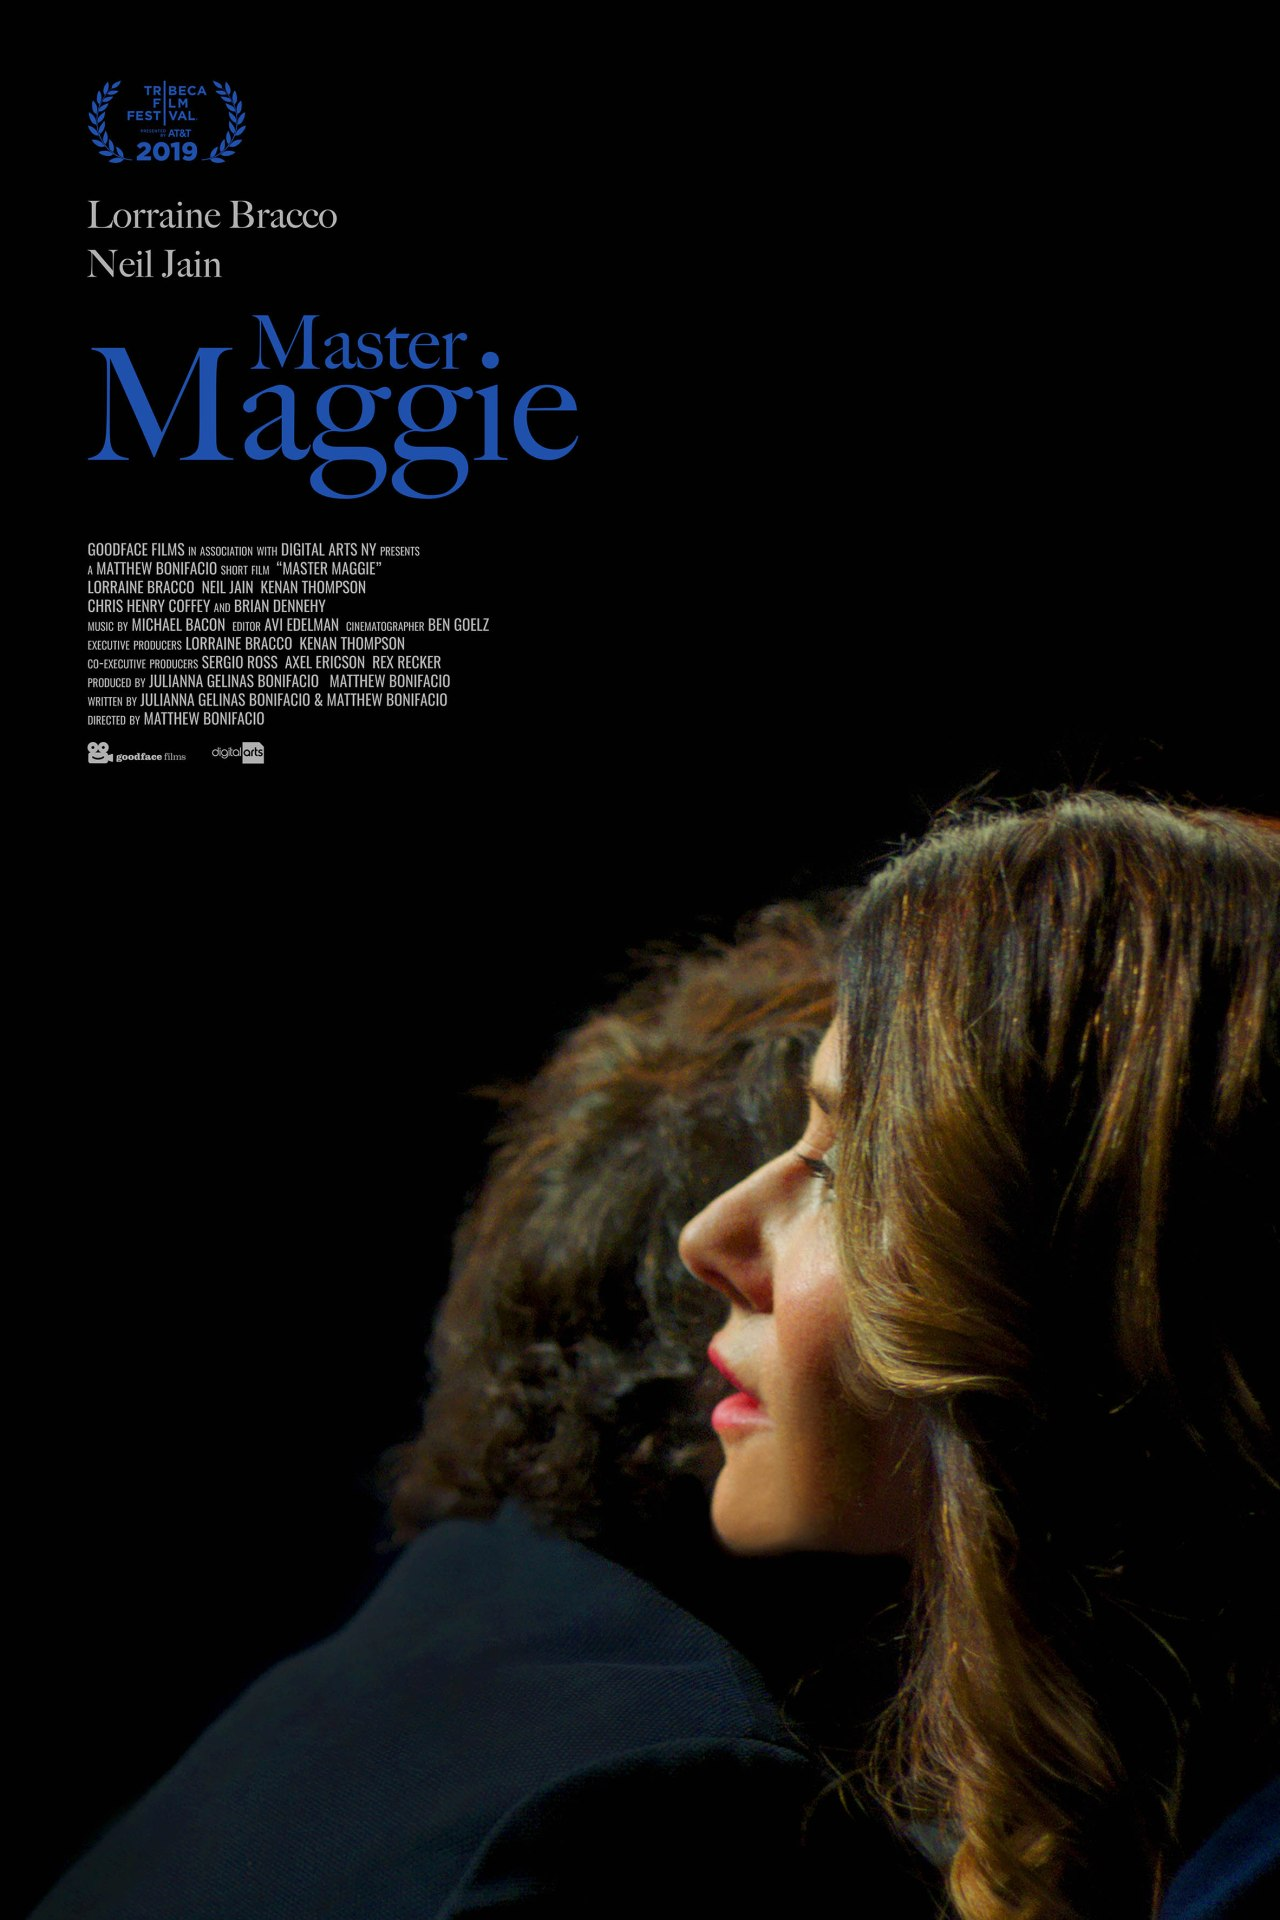 Master Maggie (2019 - Short)    SECOND ASSISTANT DIRECTOR  Official Selection:  Tribeca Film Festival 2019   Nantucket Film Festival 2019   Awards: Audience Award for Best Narrative Short - Nantucket Film Festival 2019